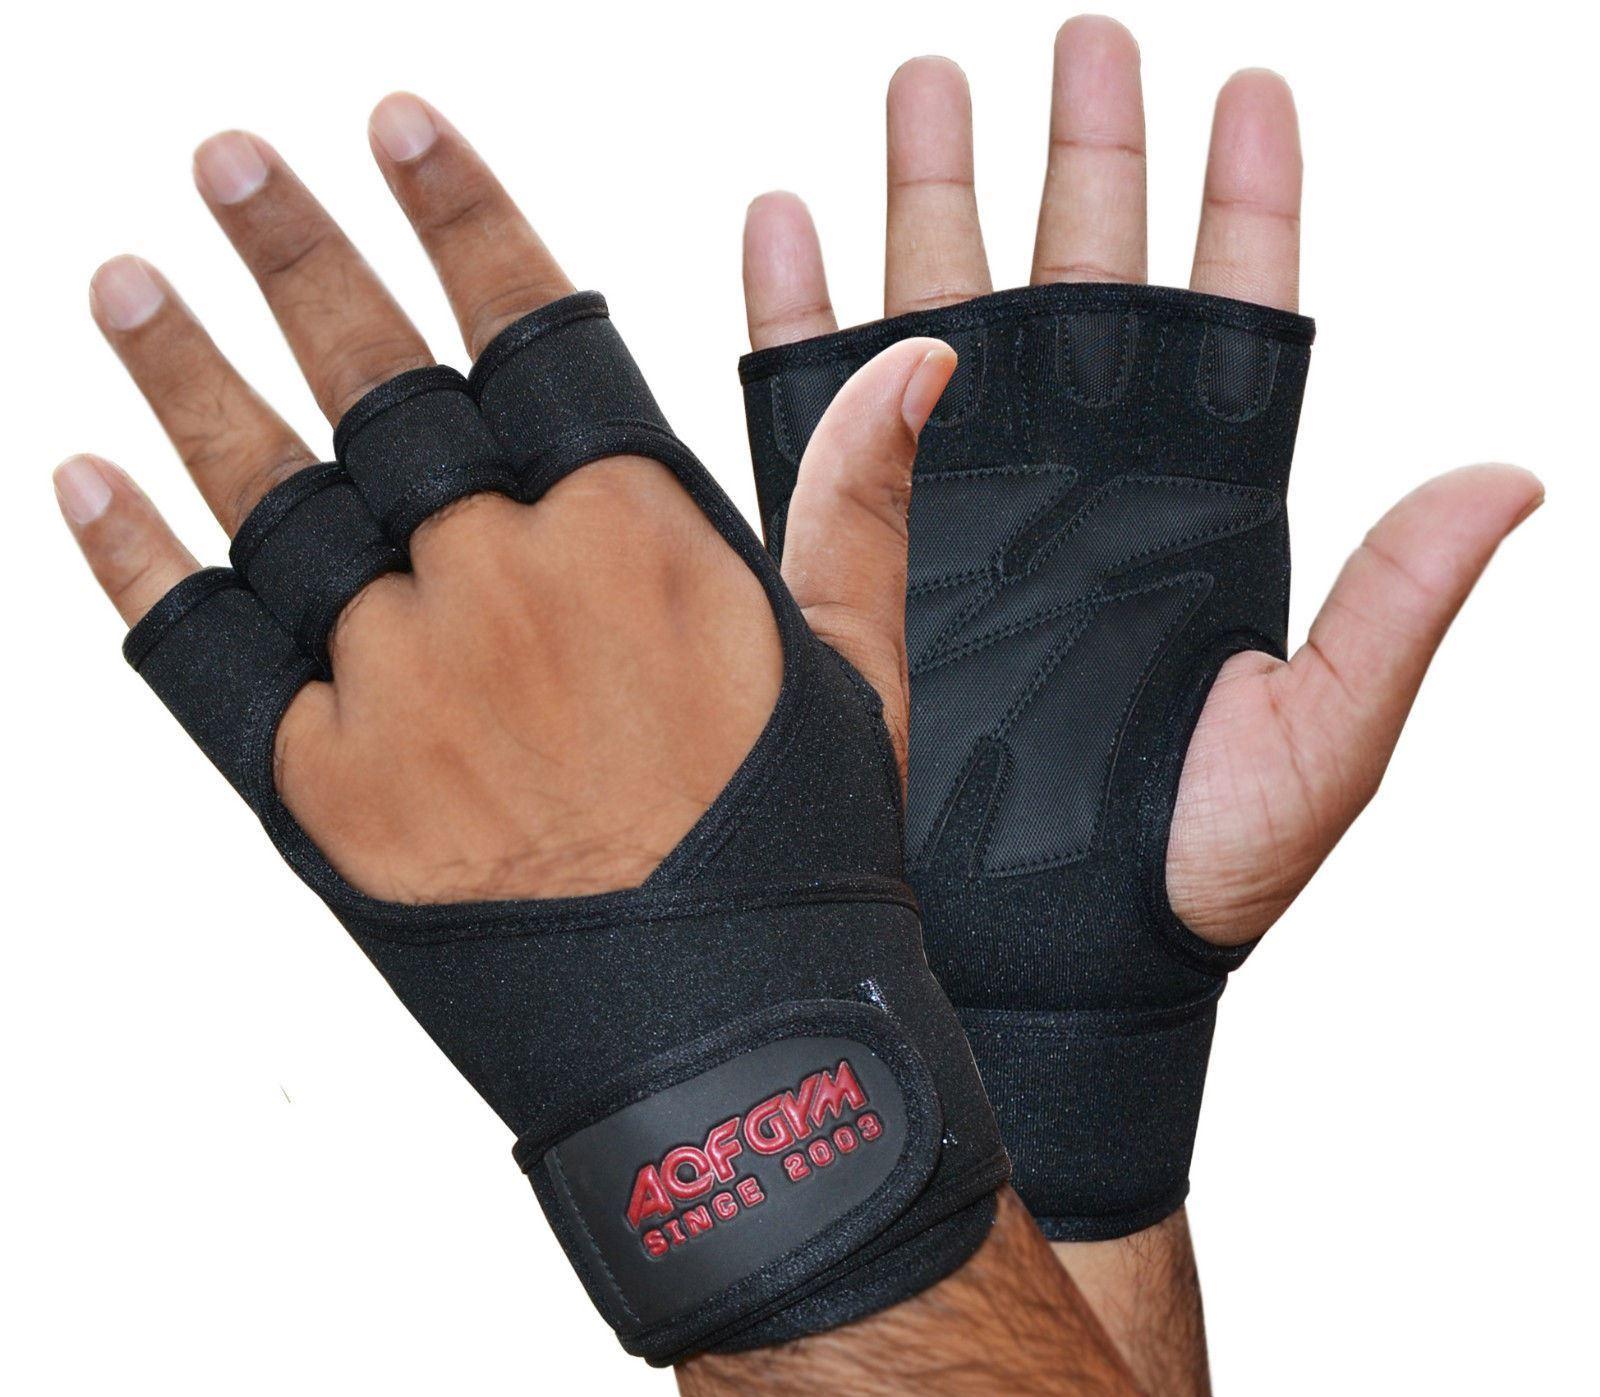 Aqf Weight Lifting Gloves Ultralight Breathable Gym Gloves: AQF Neoprene Weight Lifting Training Gloves Gym